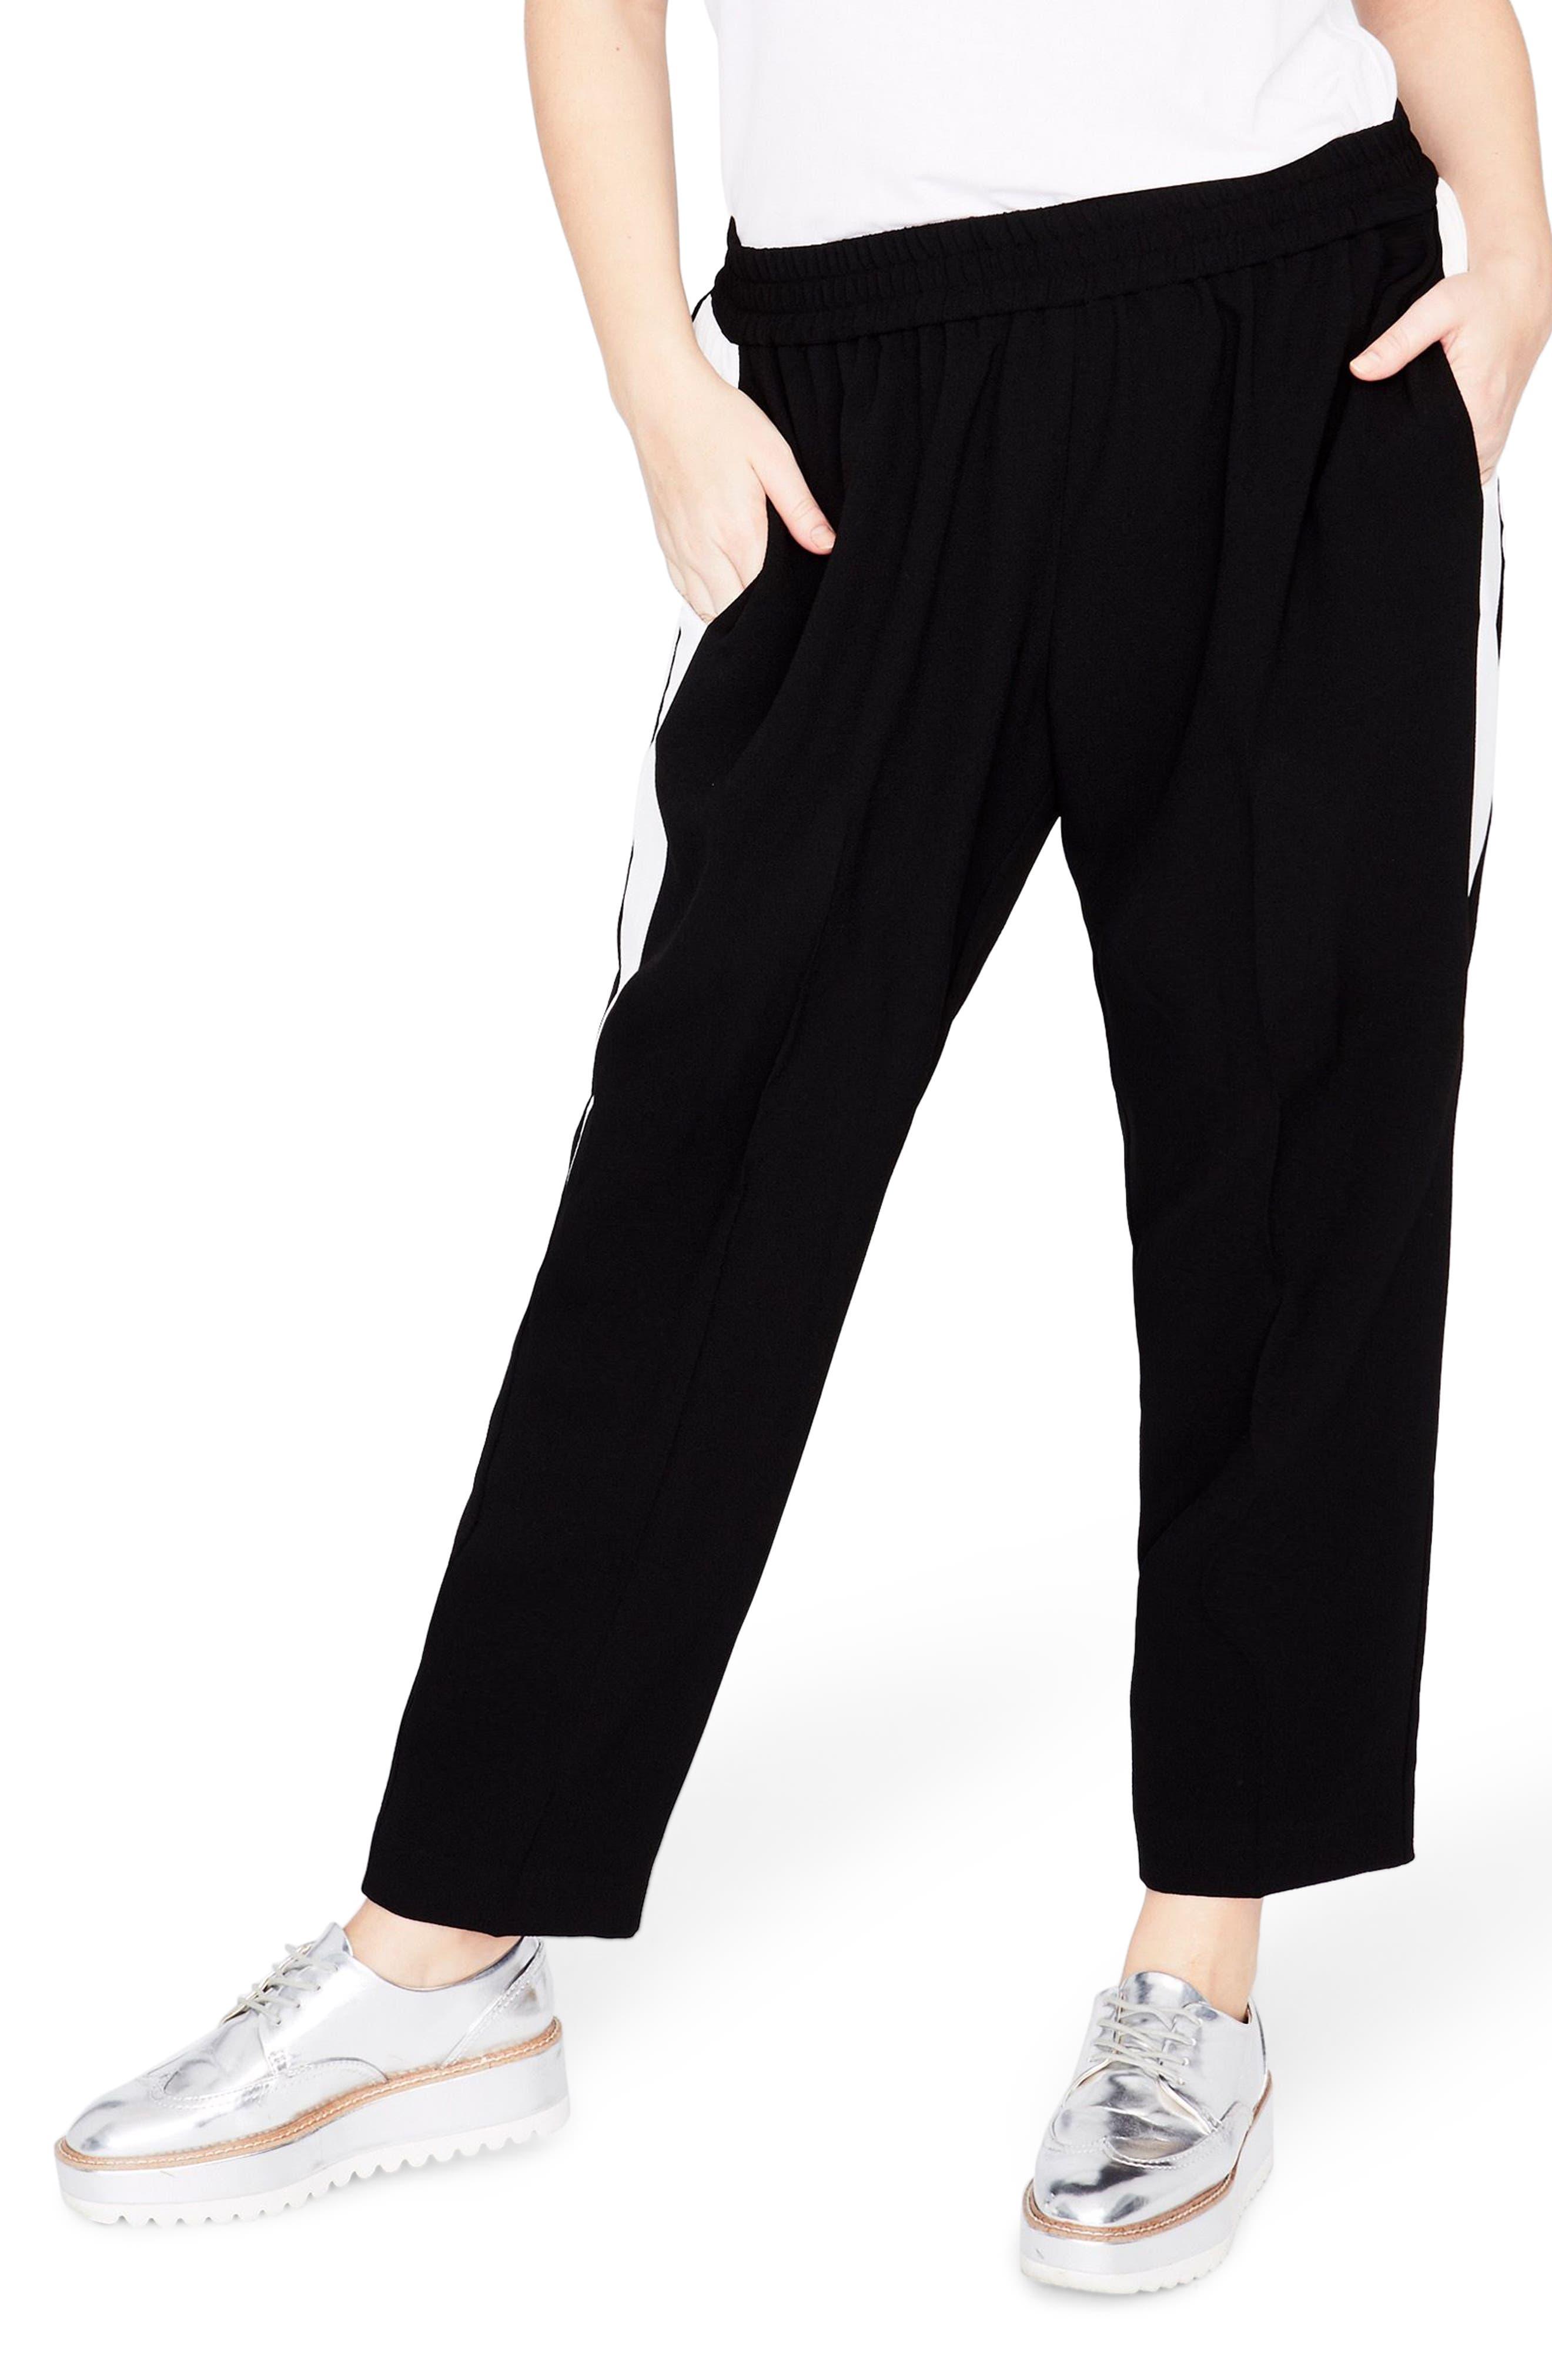 Inset Track Pants,                         Main,                         color, Black